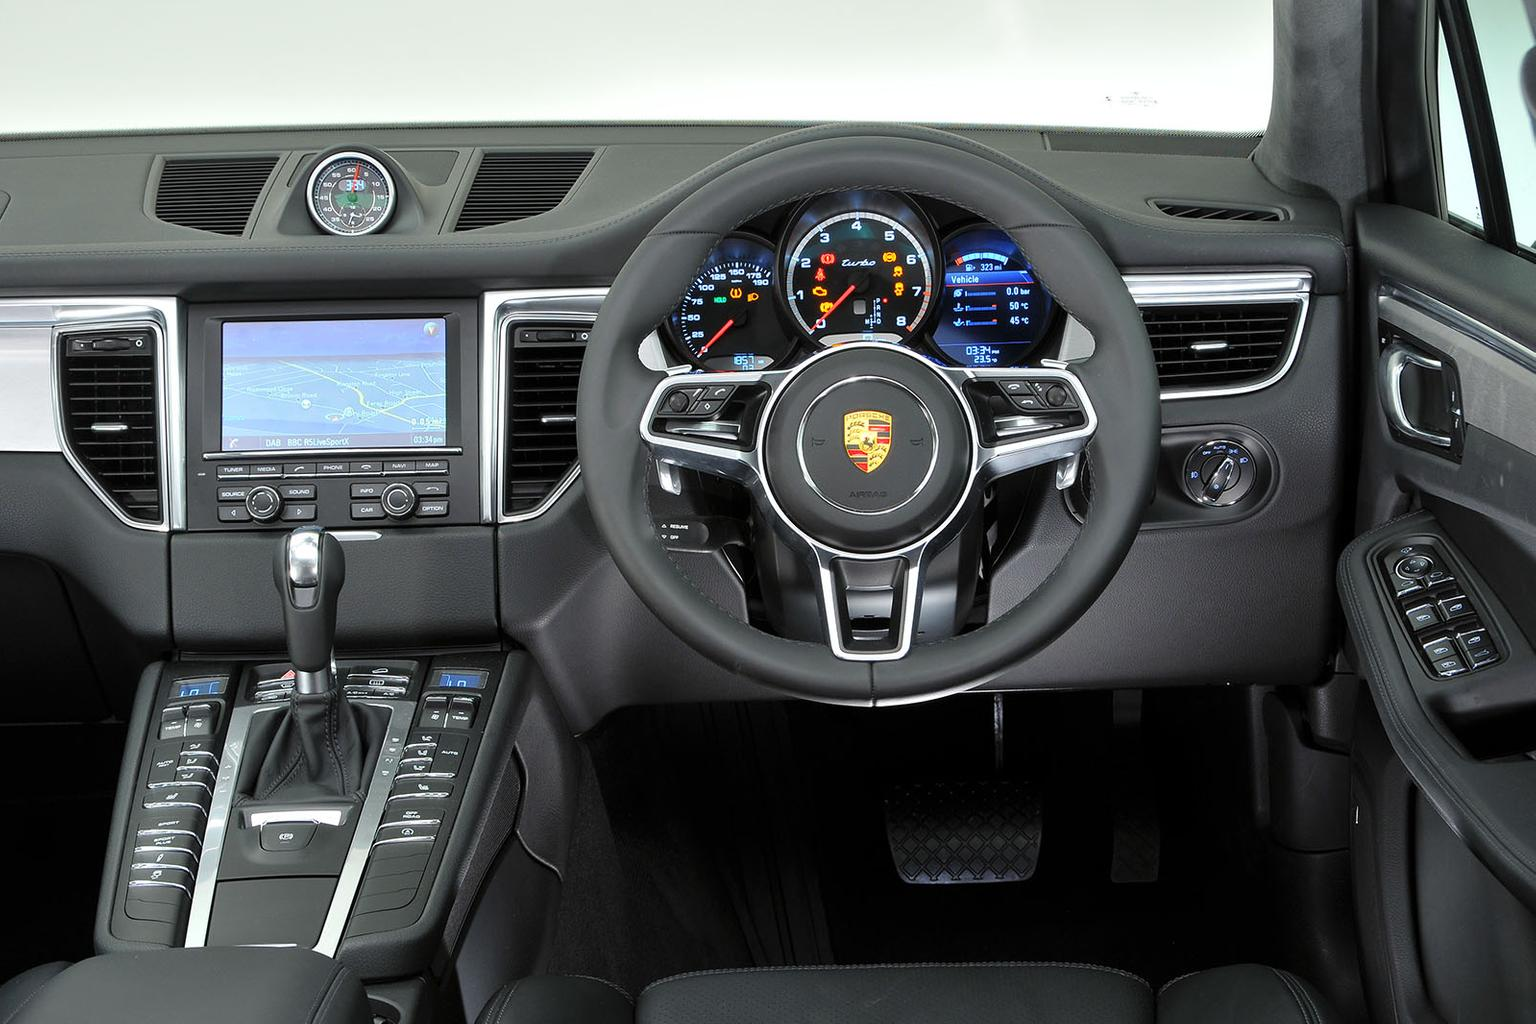 BMW M3 vs Porsche Macan Turbo